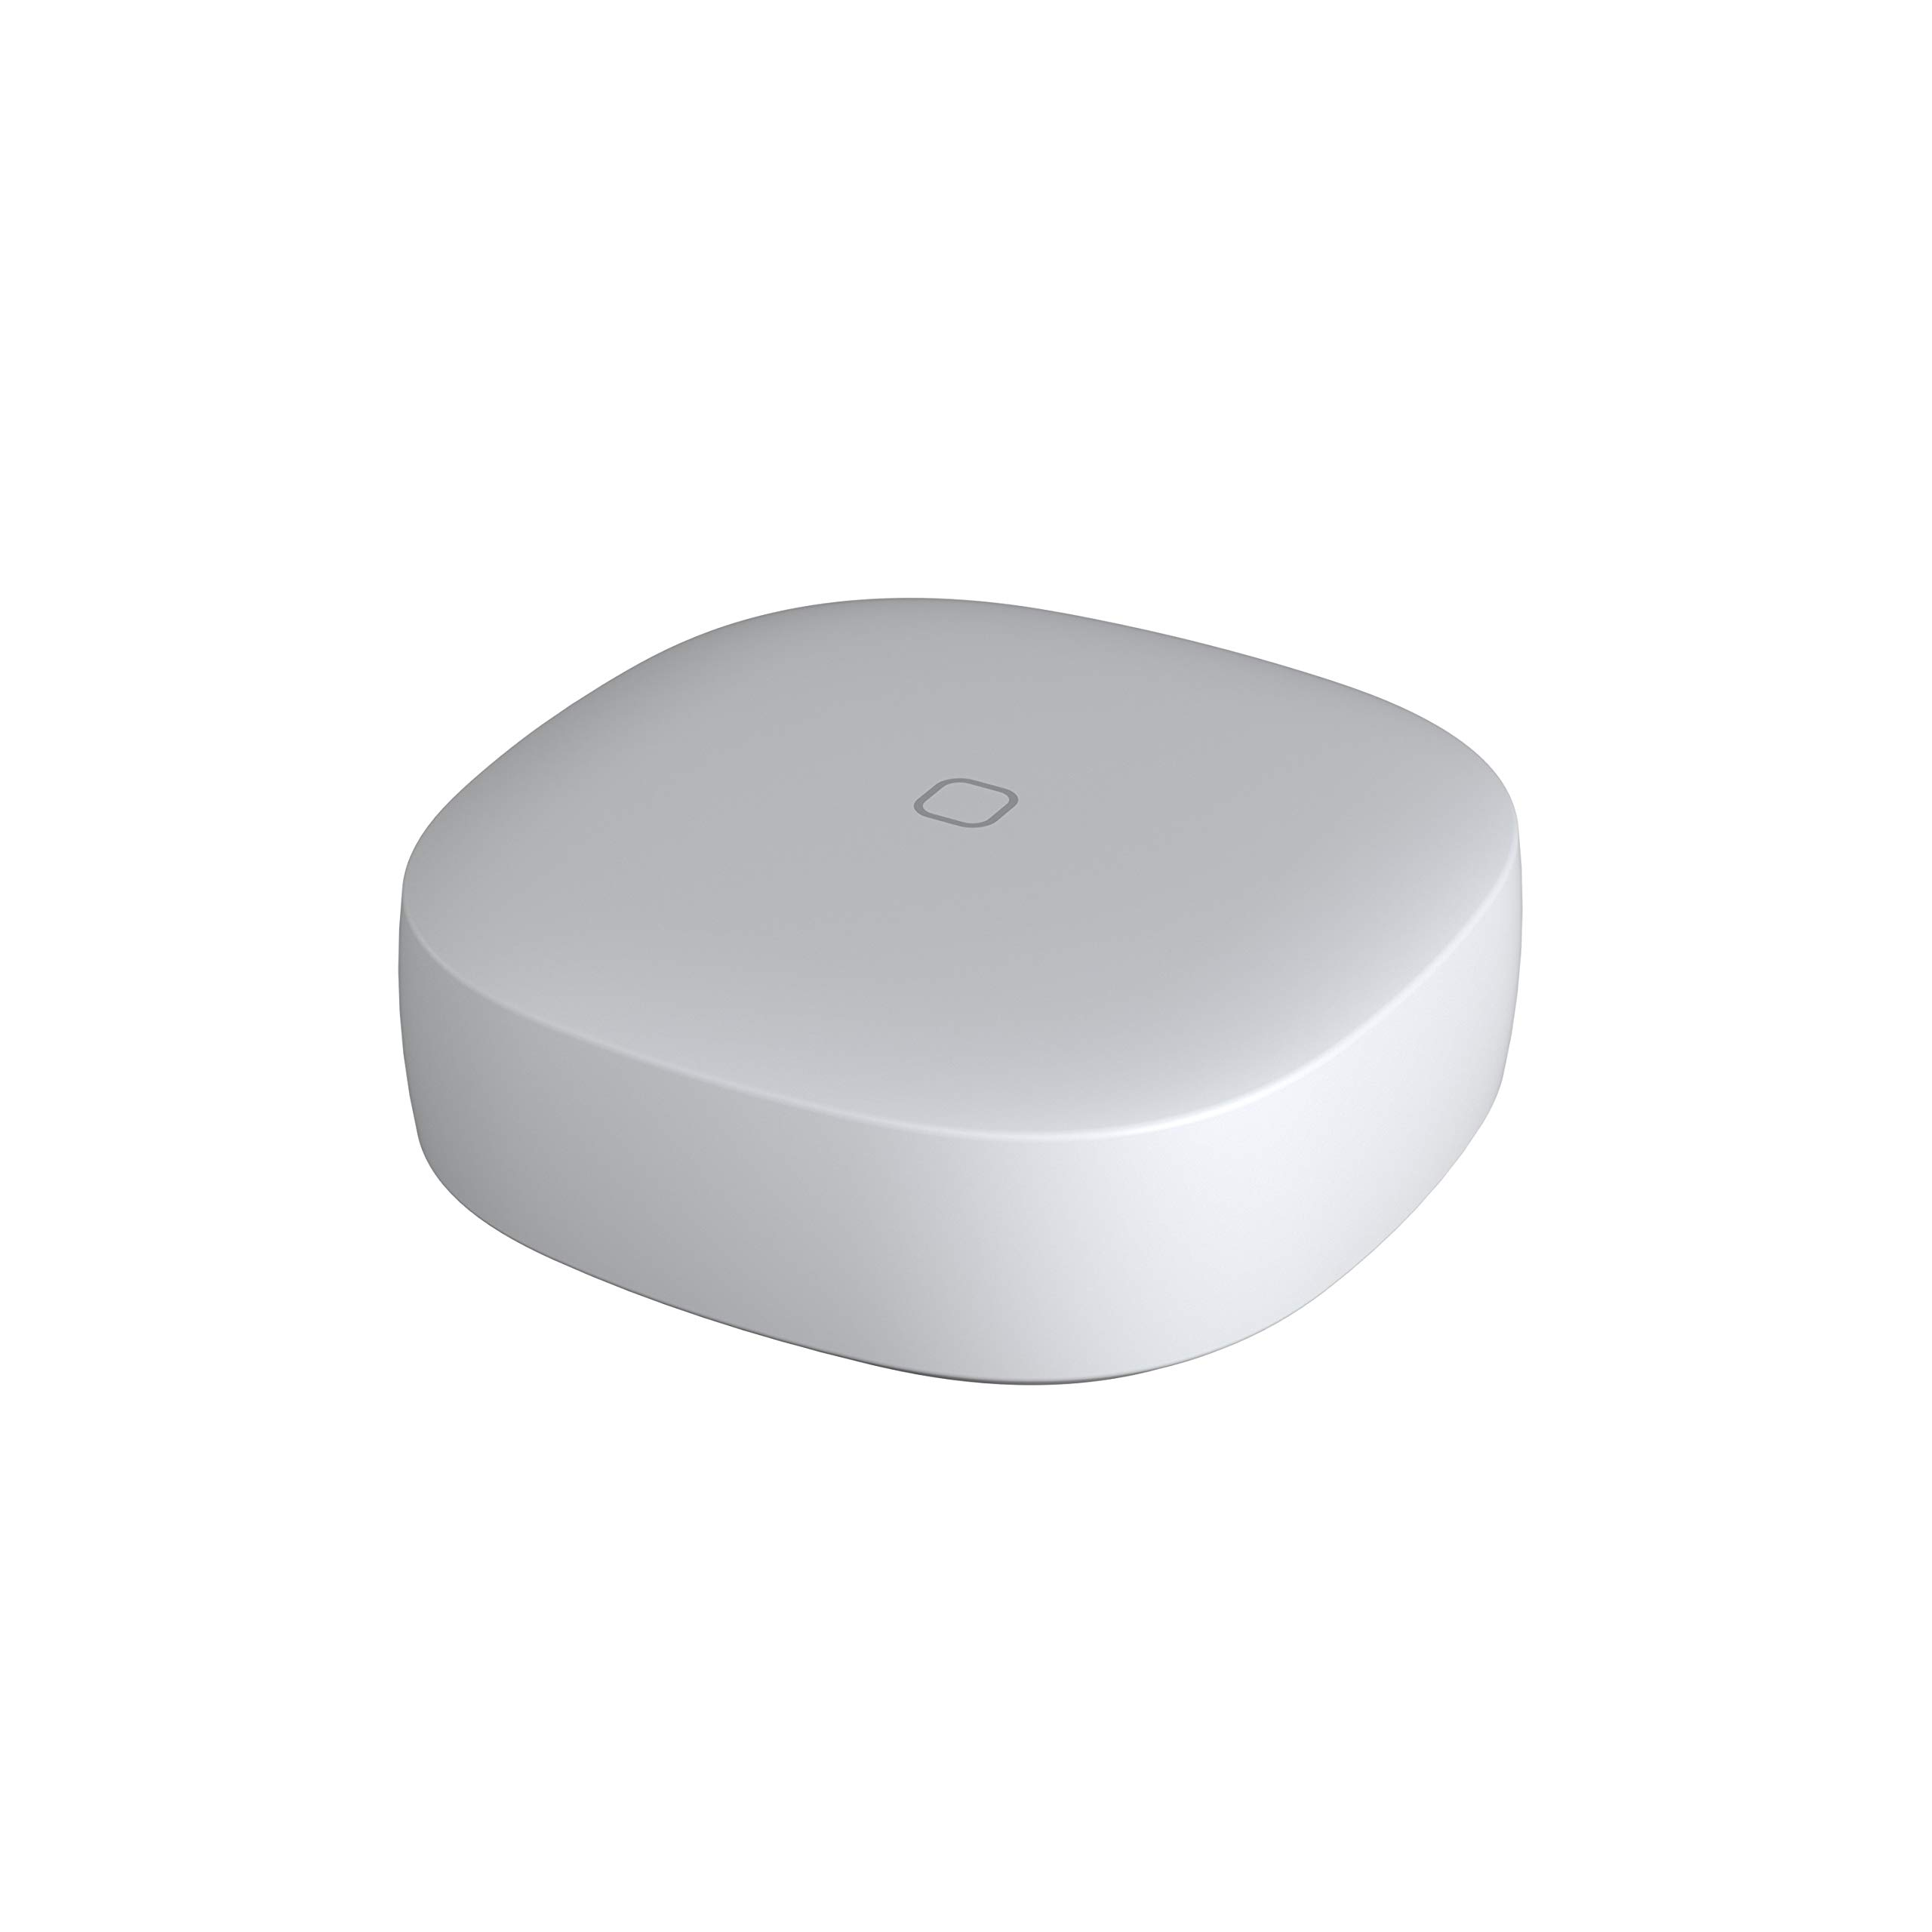 SAMSUNG SmartThings GP-U999SJVLEAA Remote Button, White